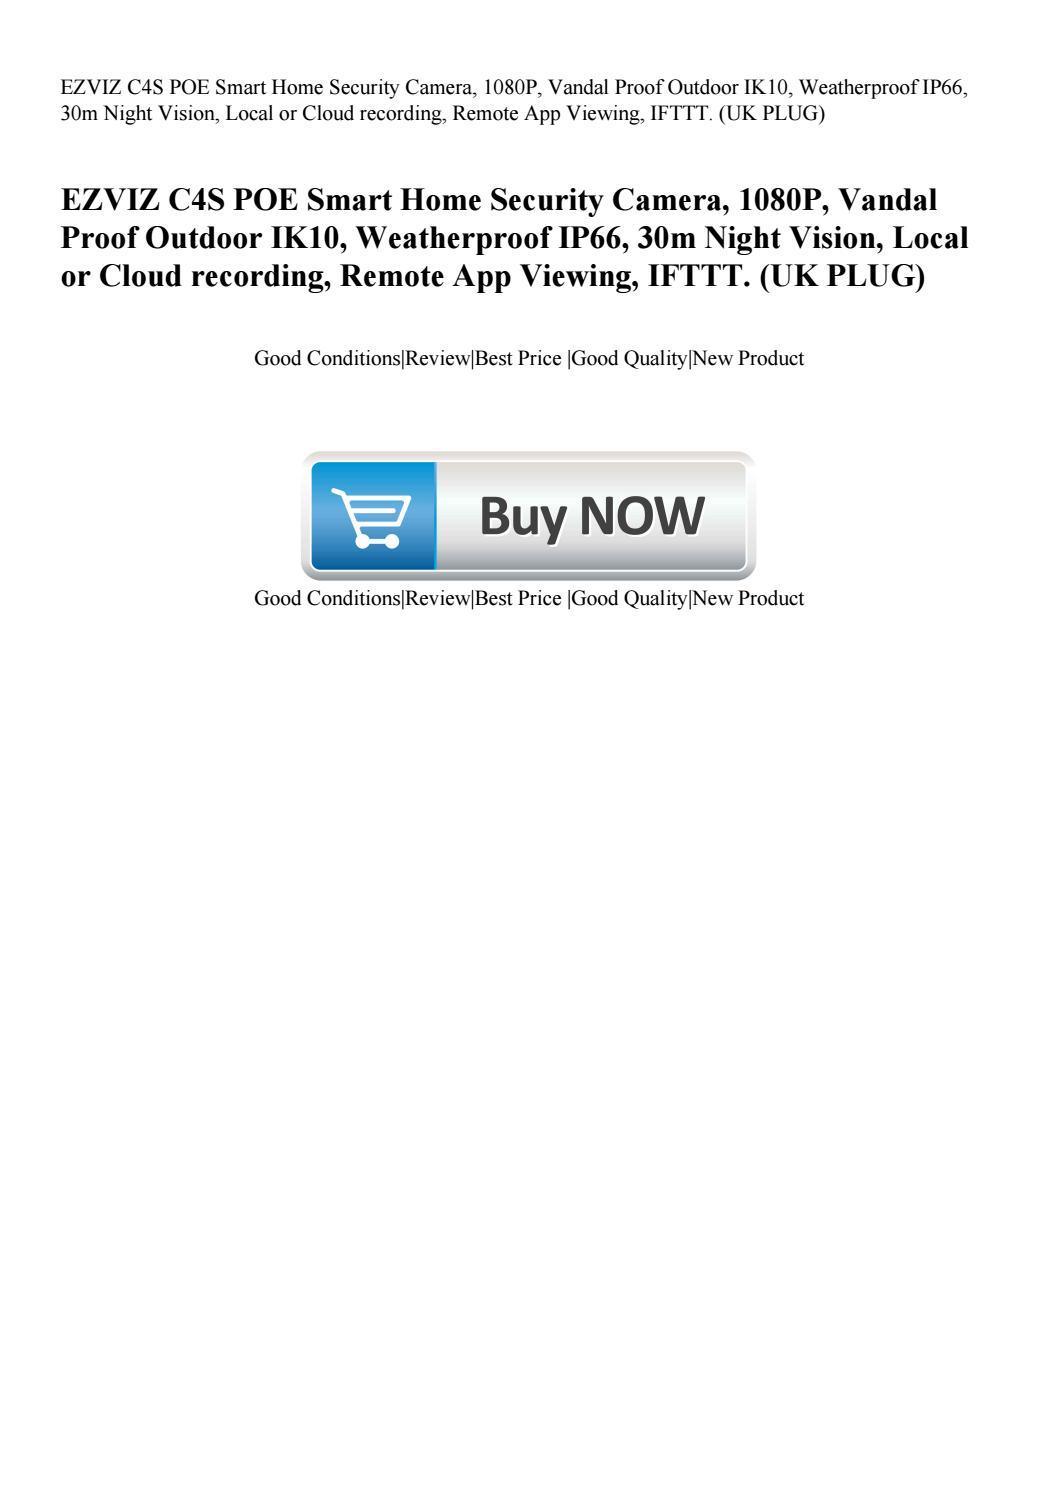 EZVIZ C4S POE Smart Home Security Camera 1080P Vandal Proof